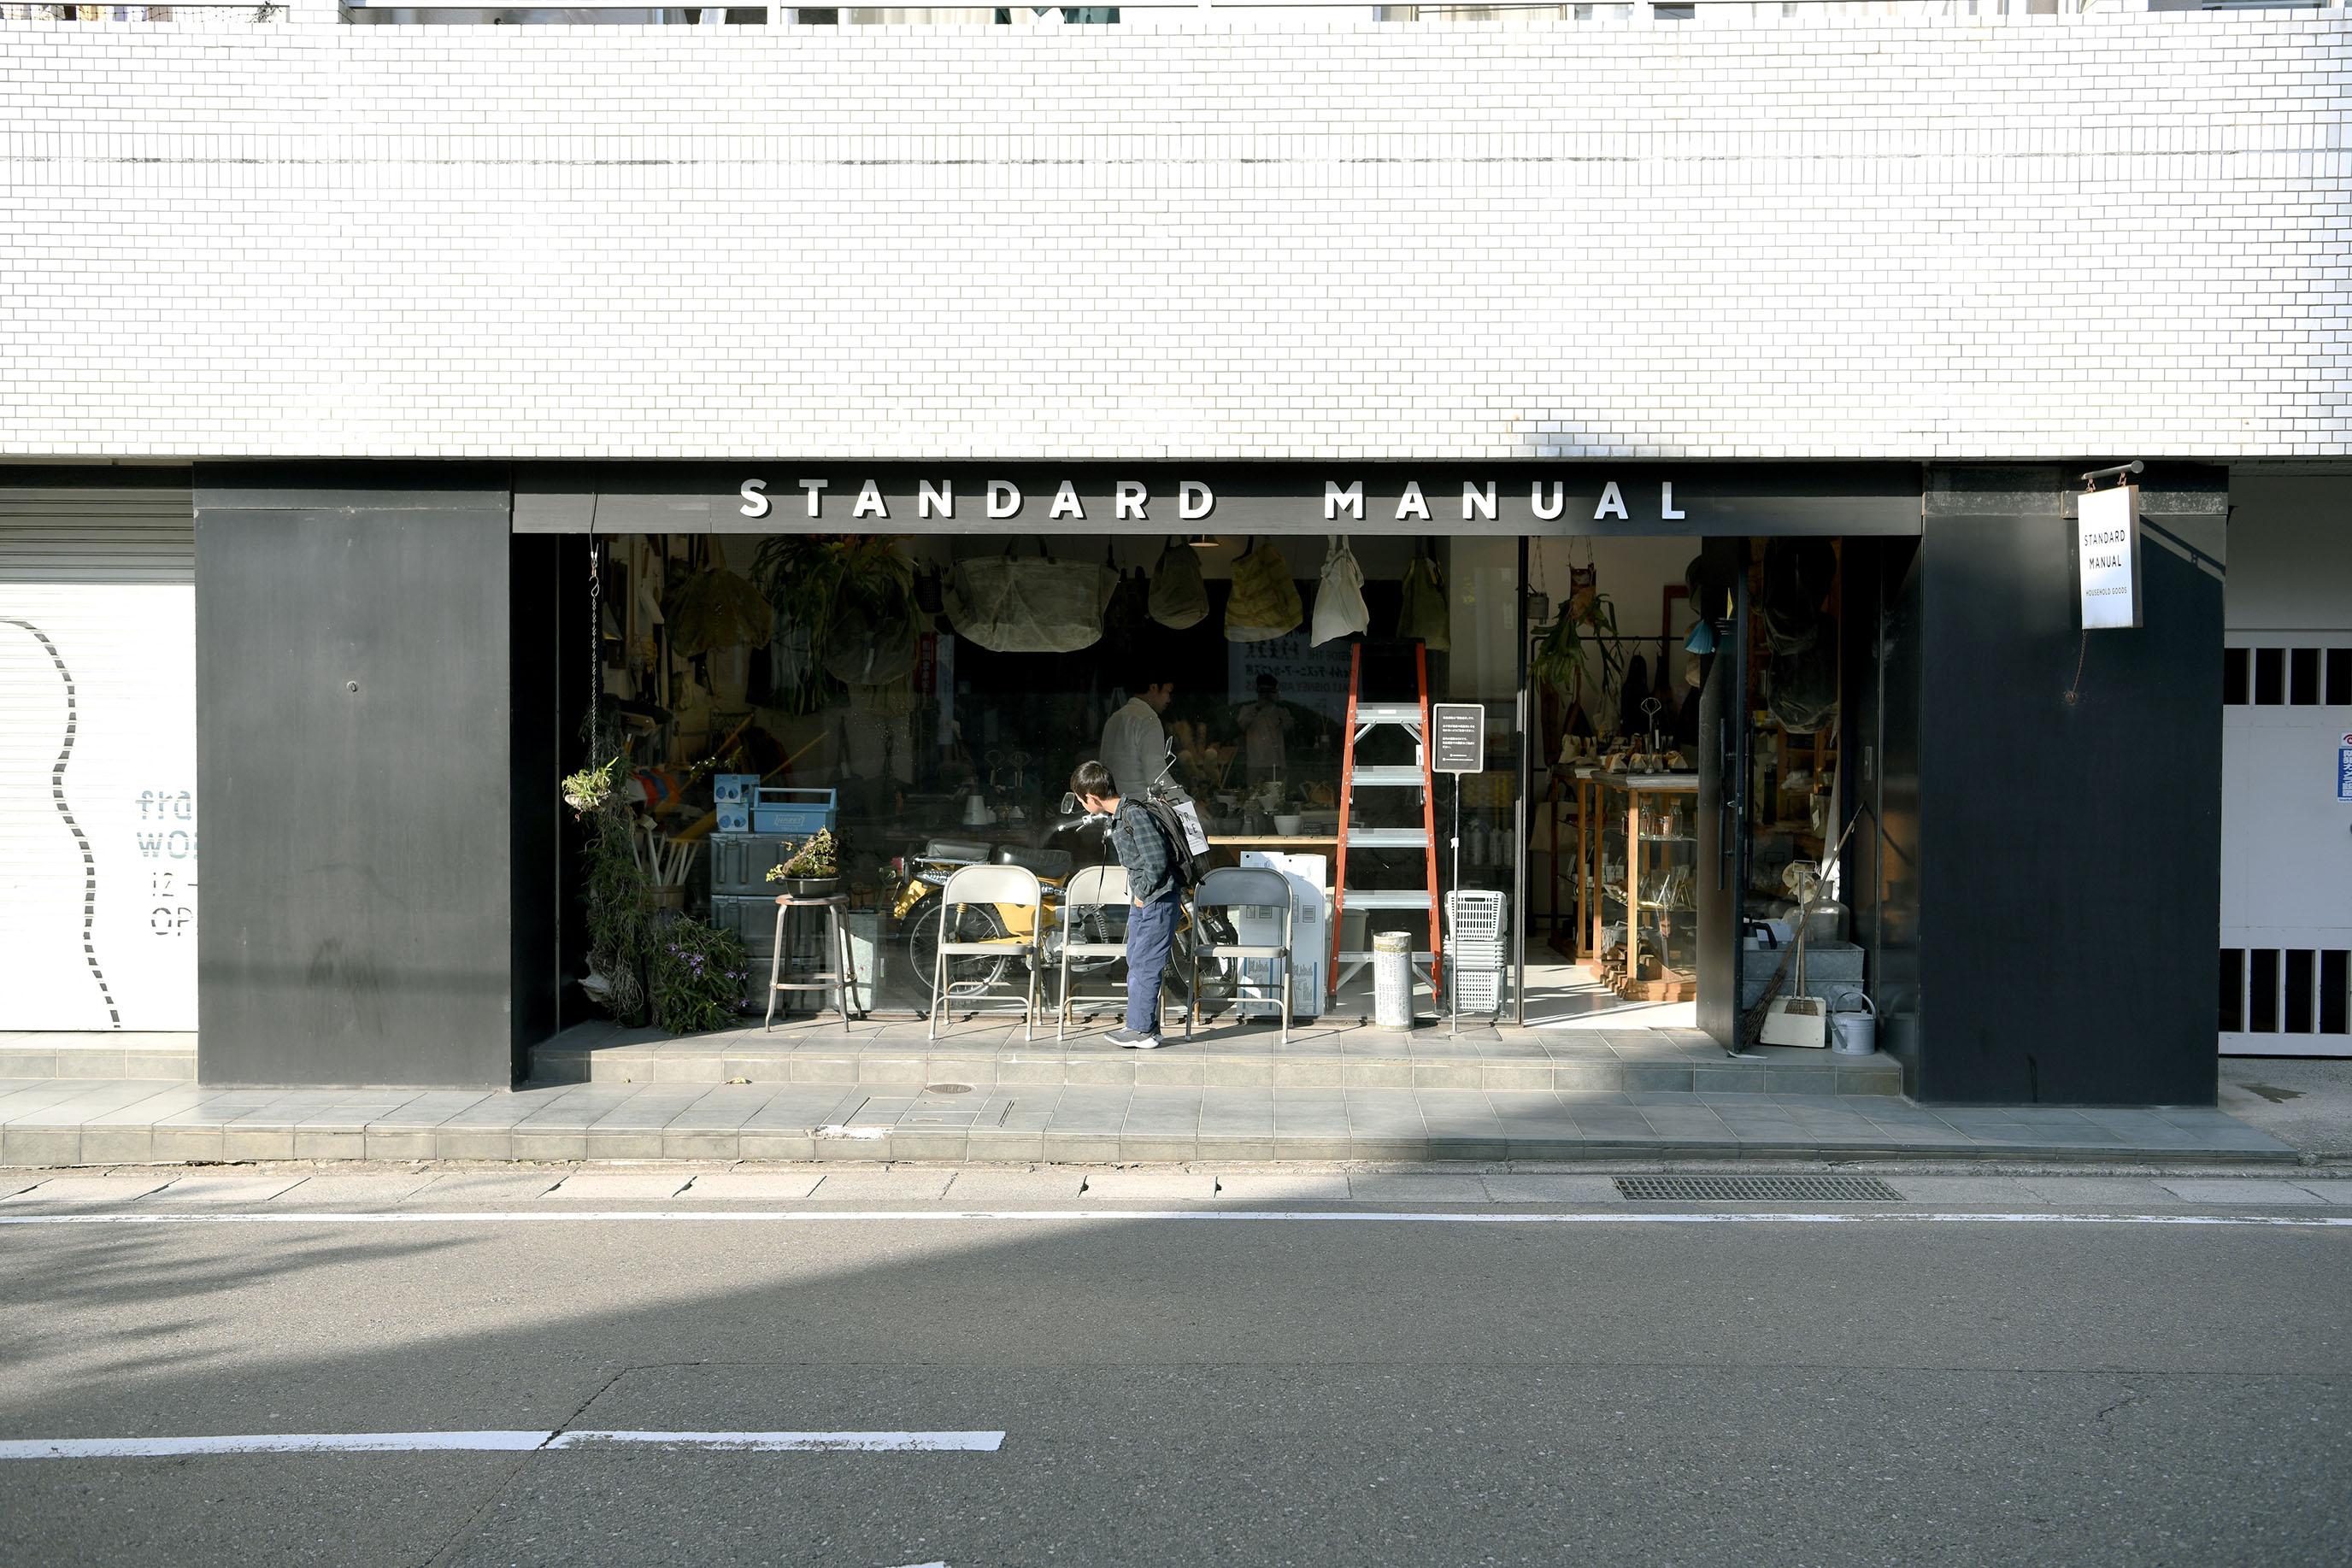 STANDARD MANUAL 福岡